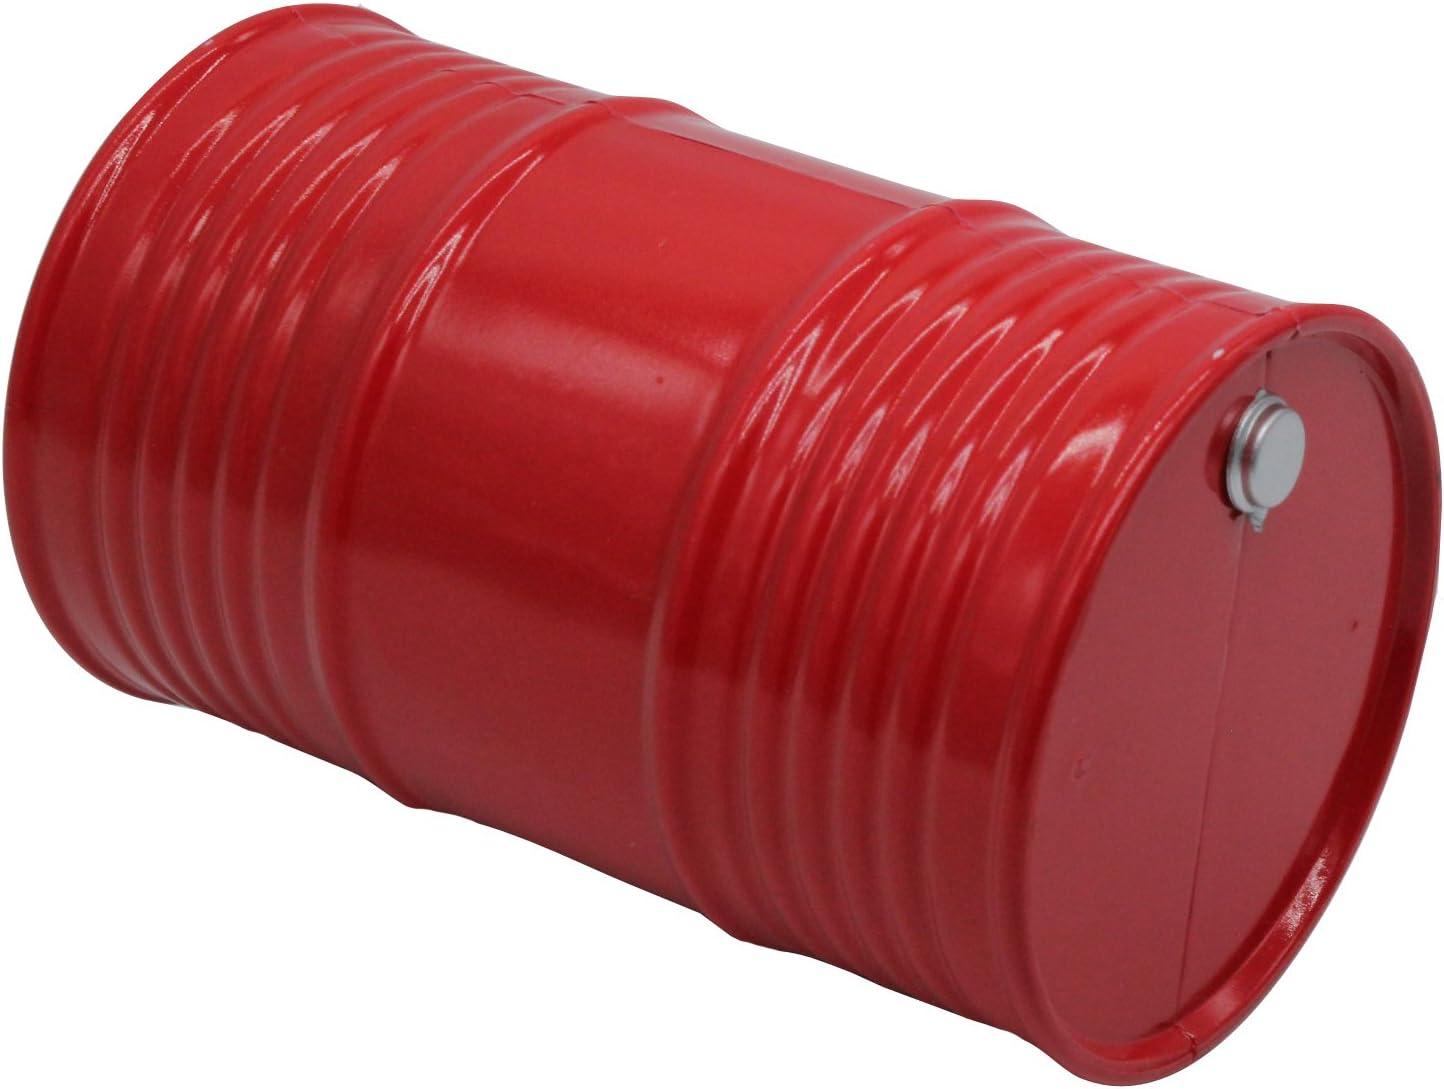 RC Car Mini Plastic Coke Bottle Tray Model for 1//10 Rock Crawler Tamiya CC01